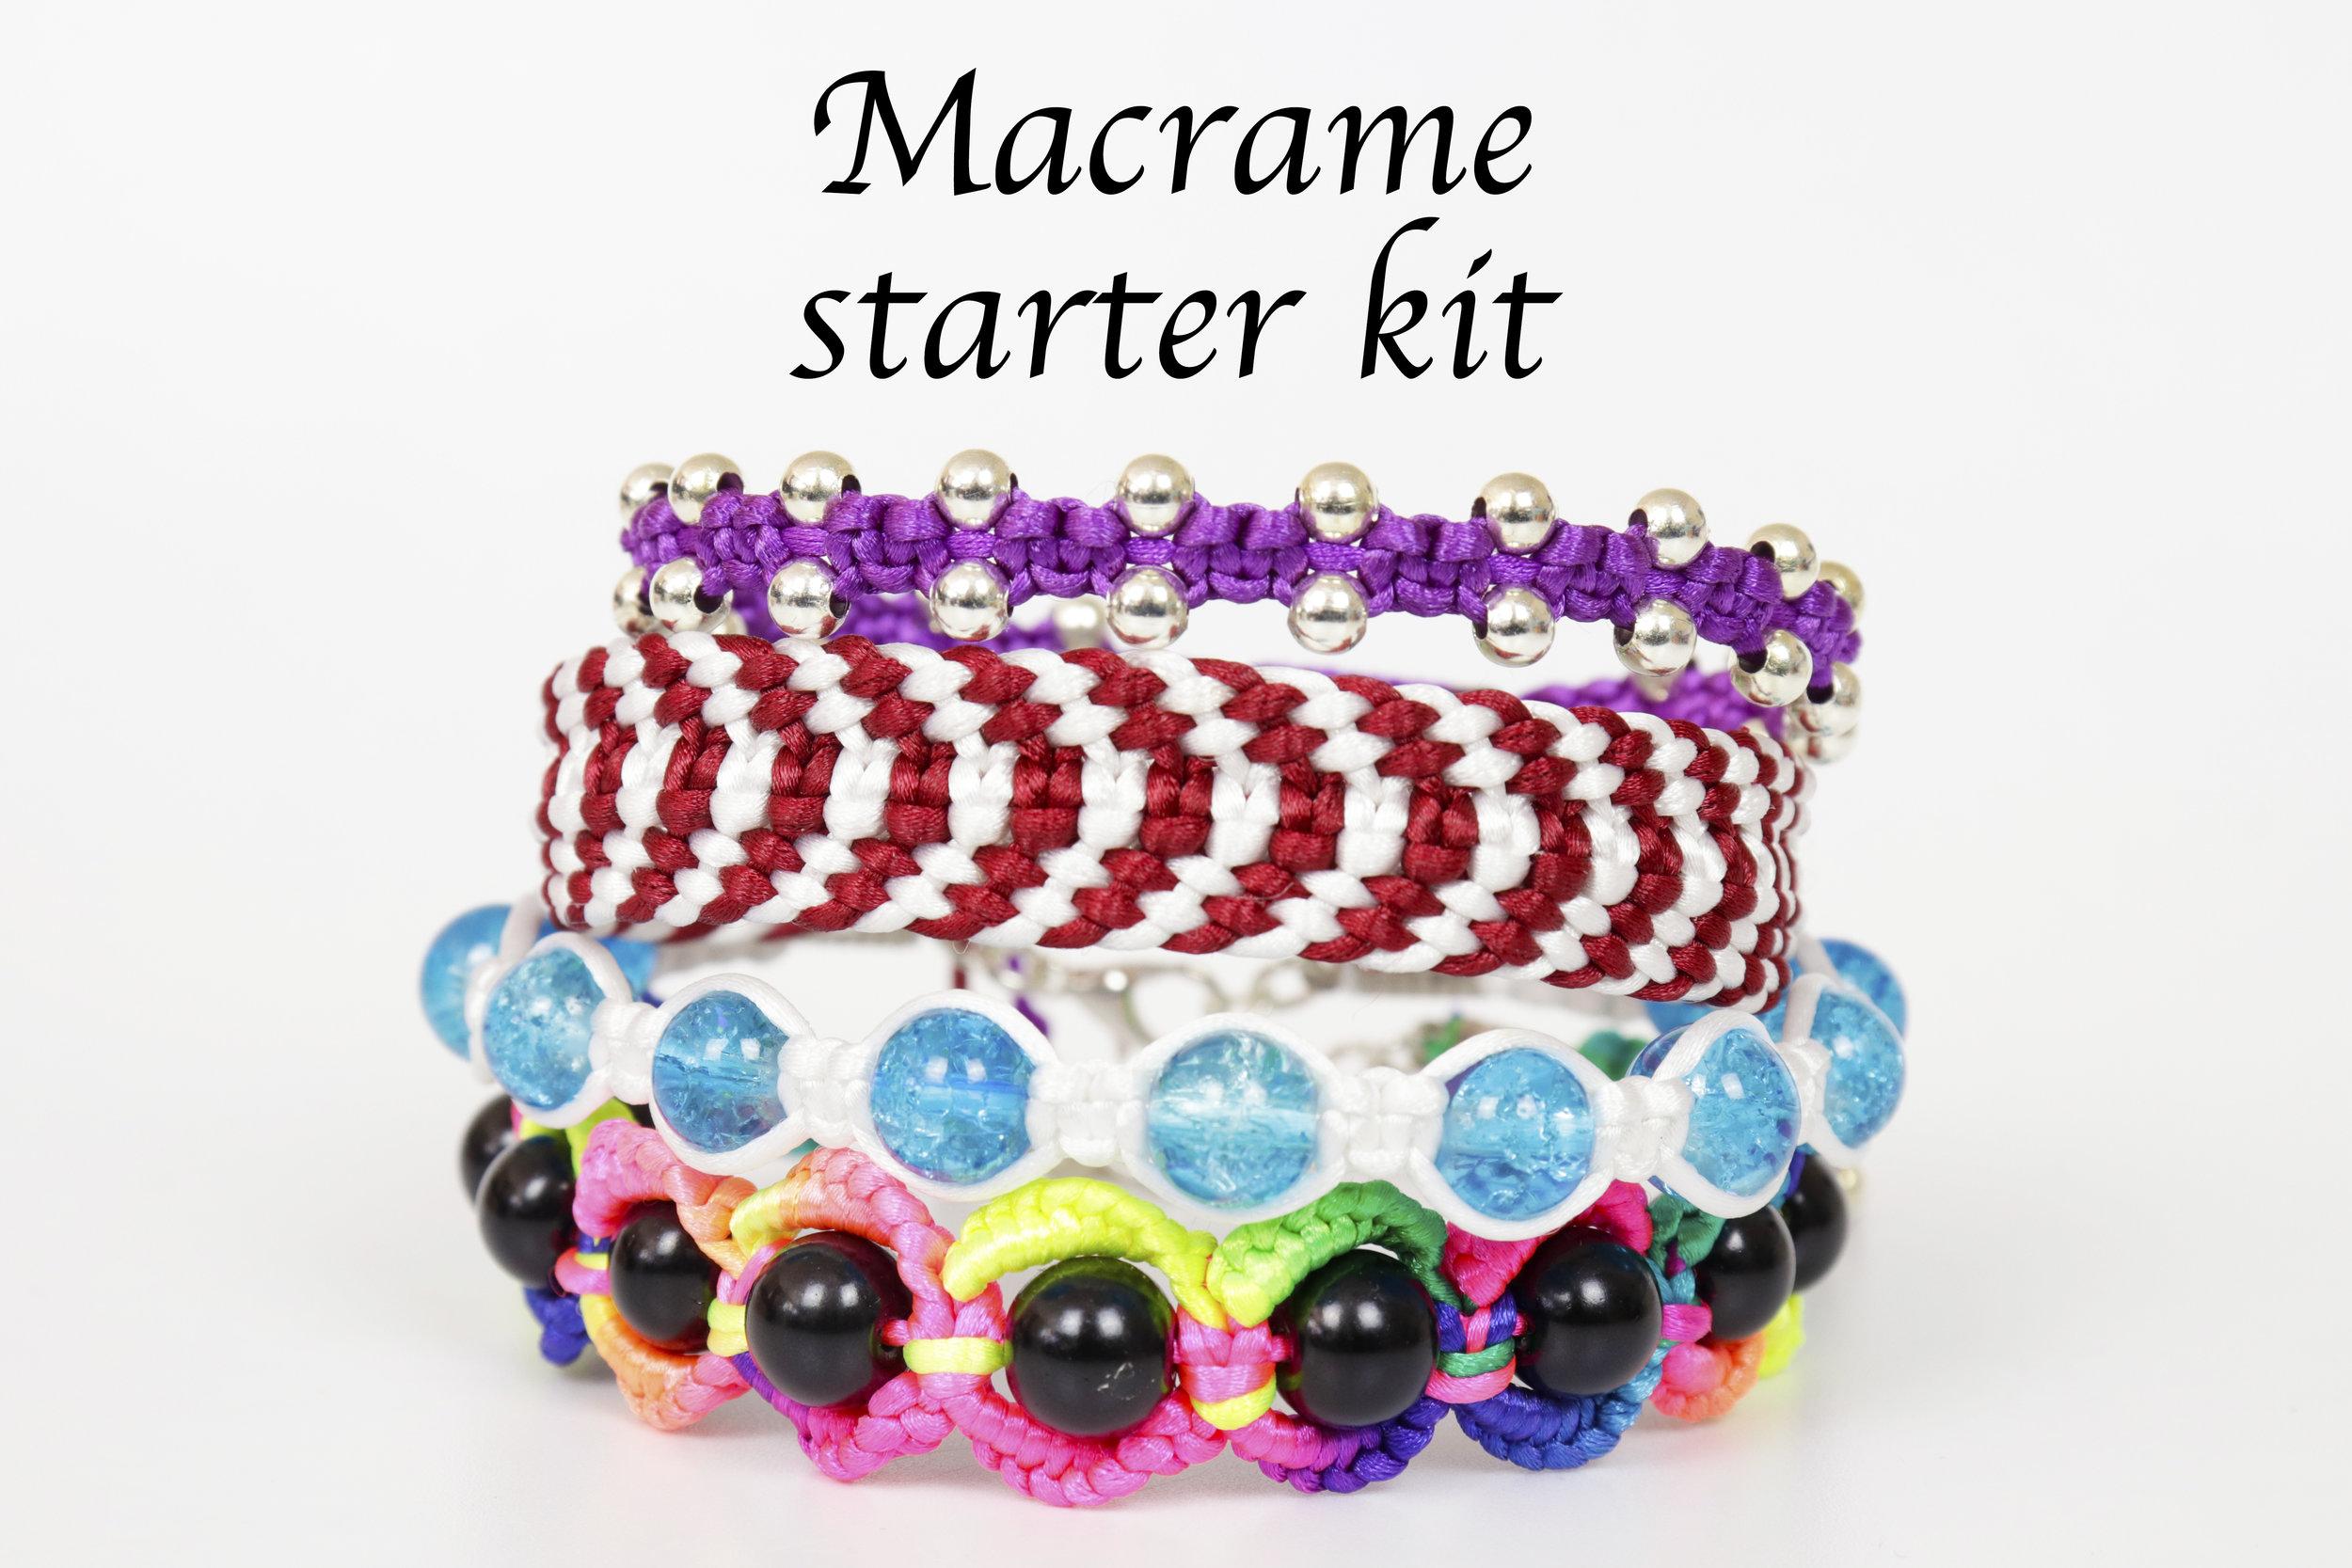 Macrame starter kit main image 2.jpg